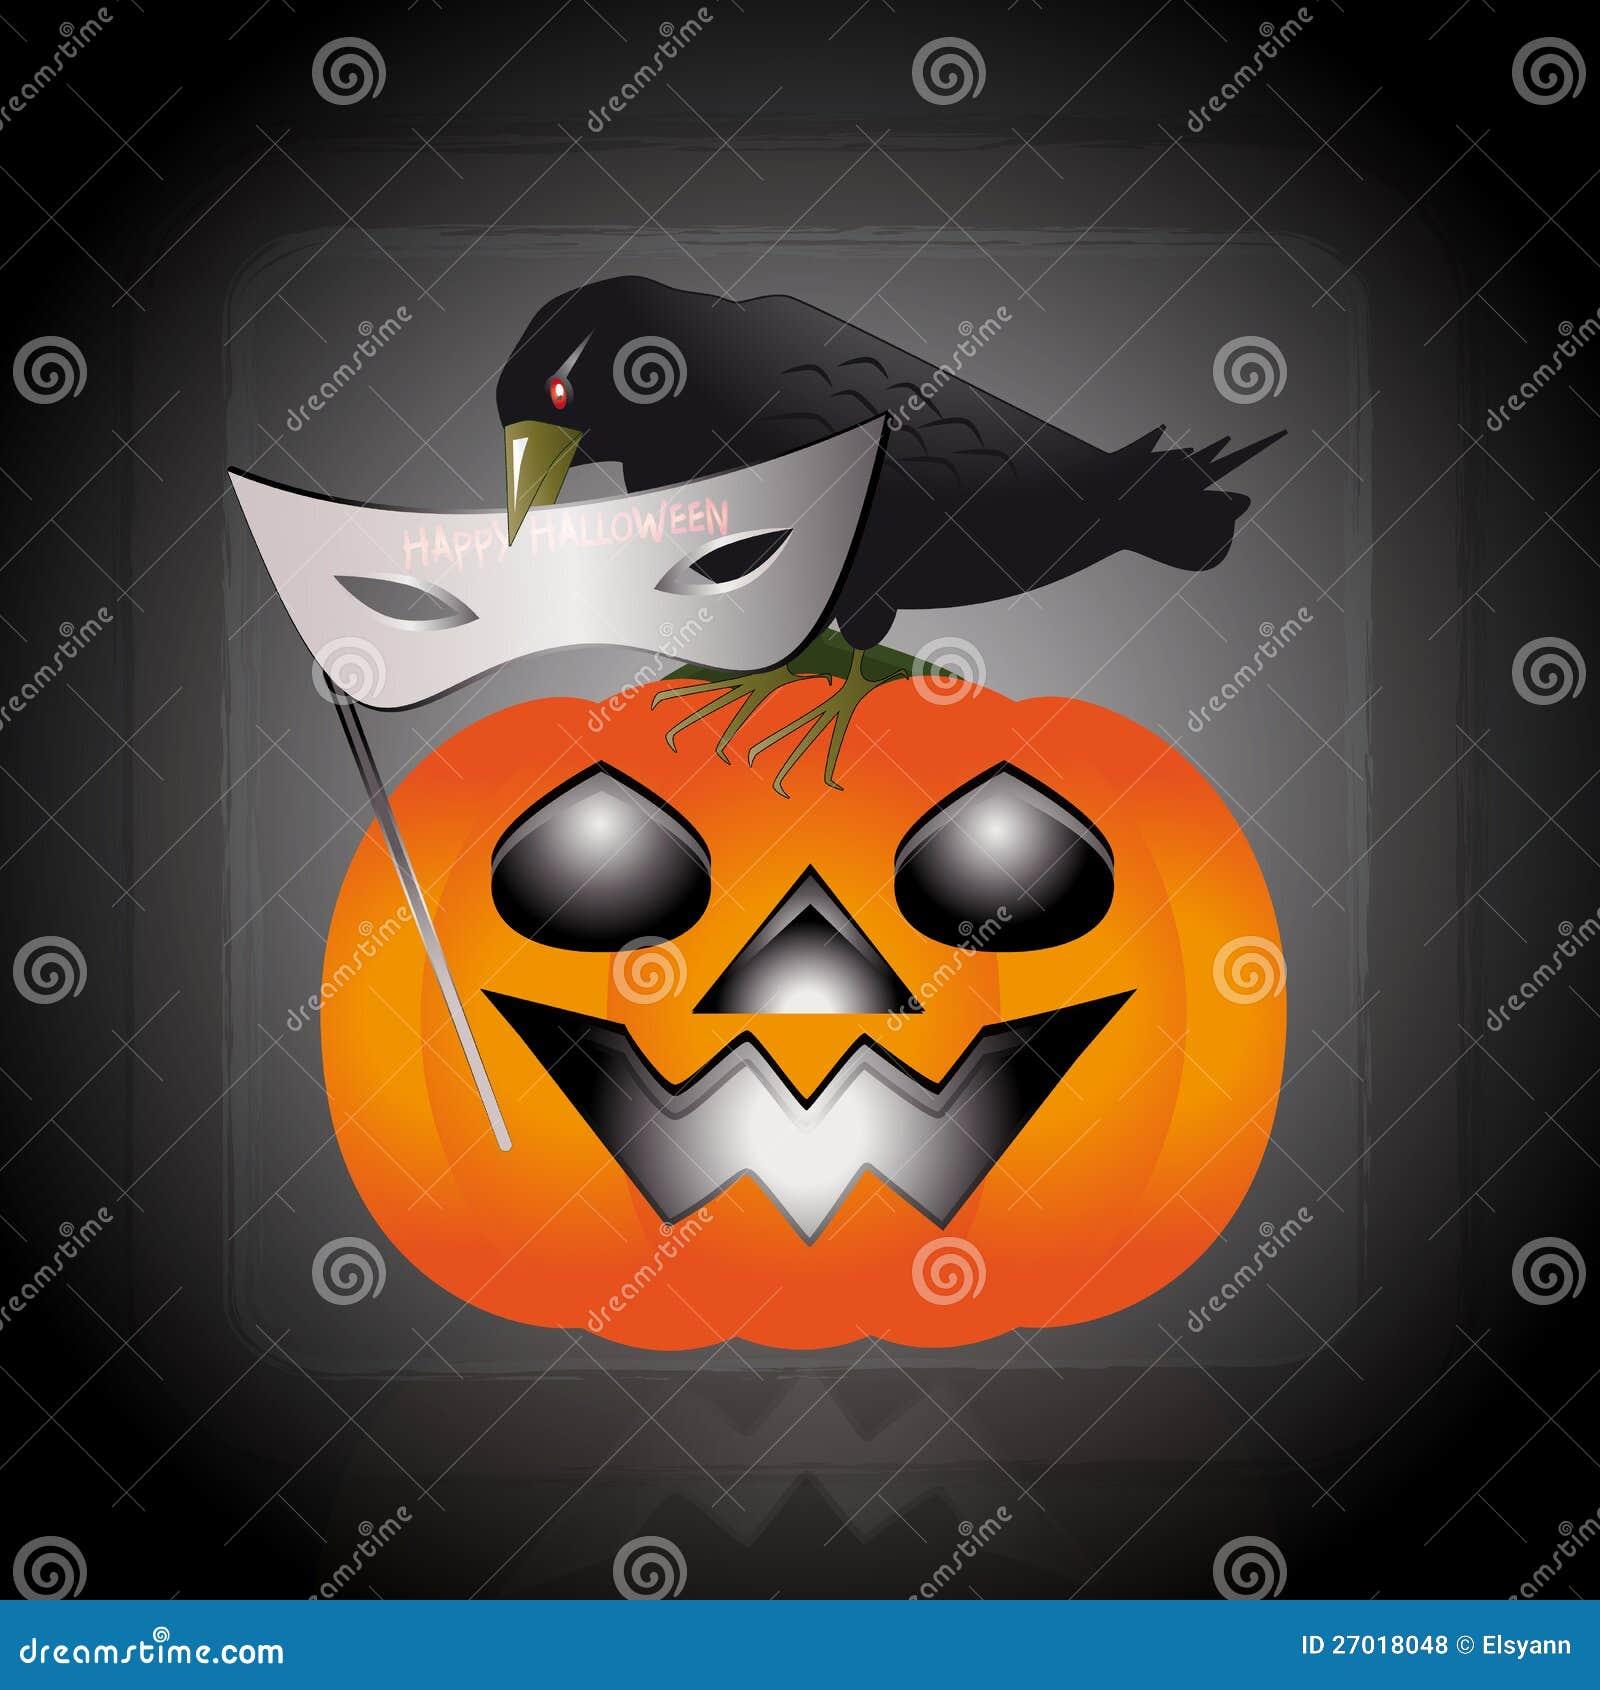 Mask Of Halloween Royalty Free Stock Photos - Image: 27018048